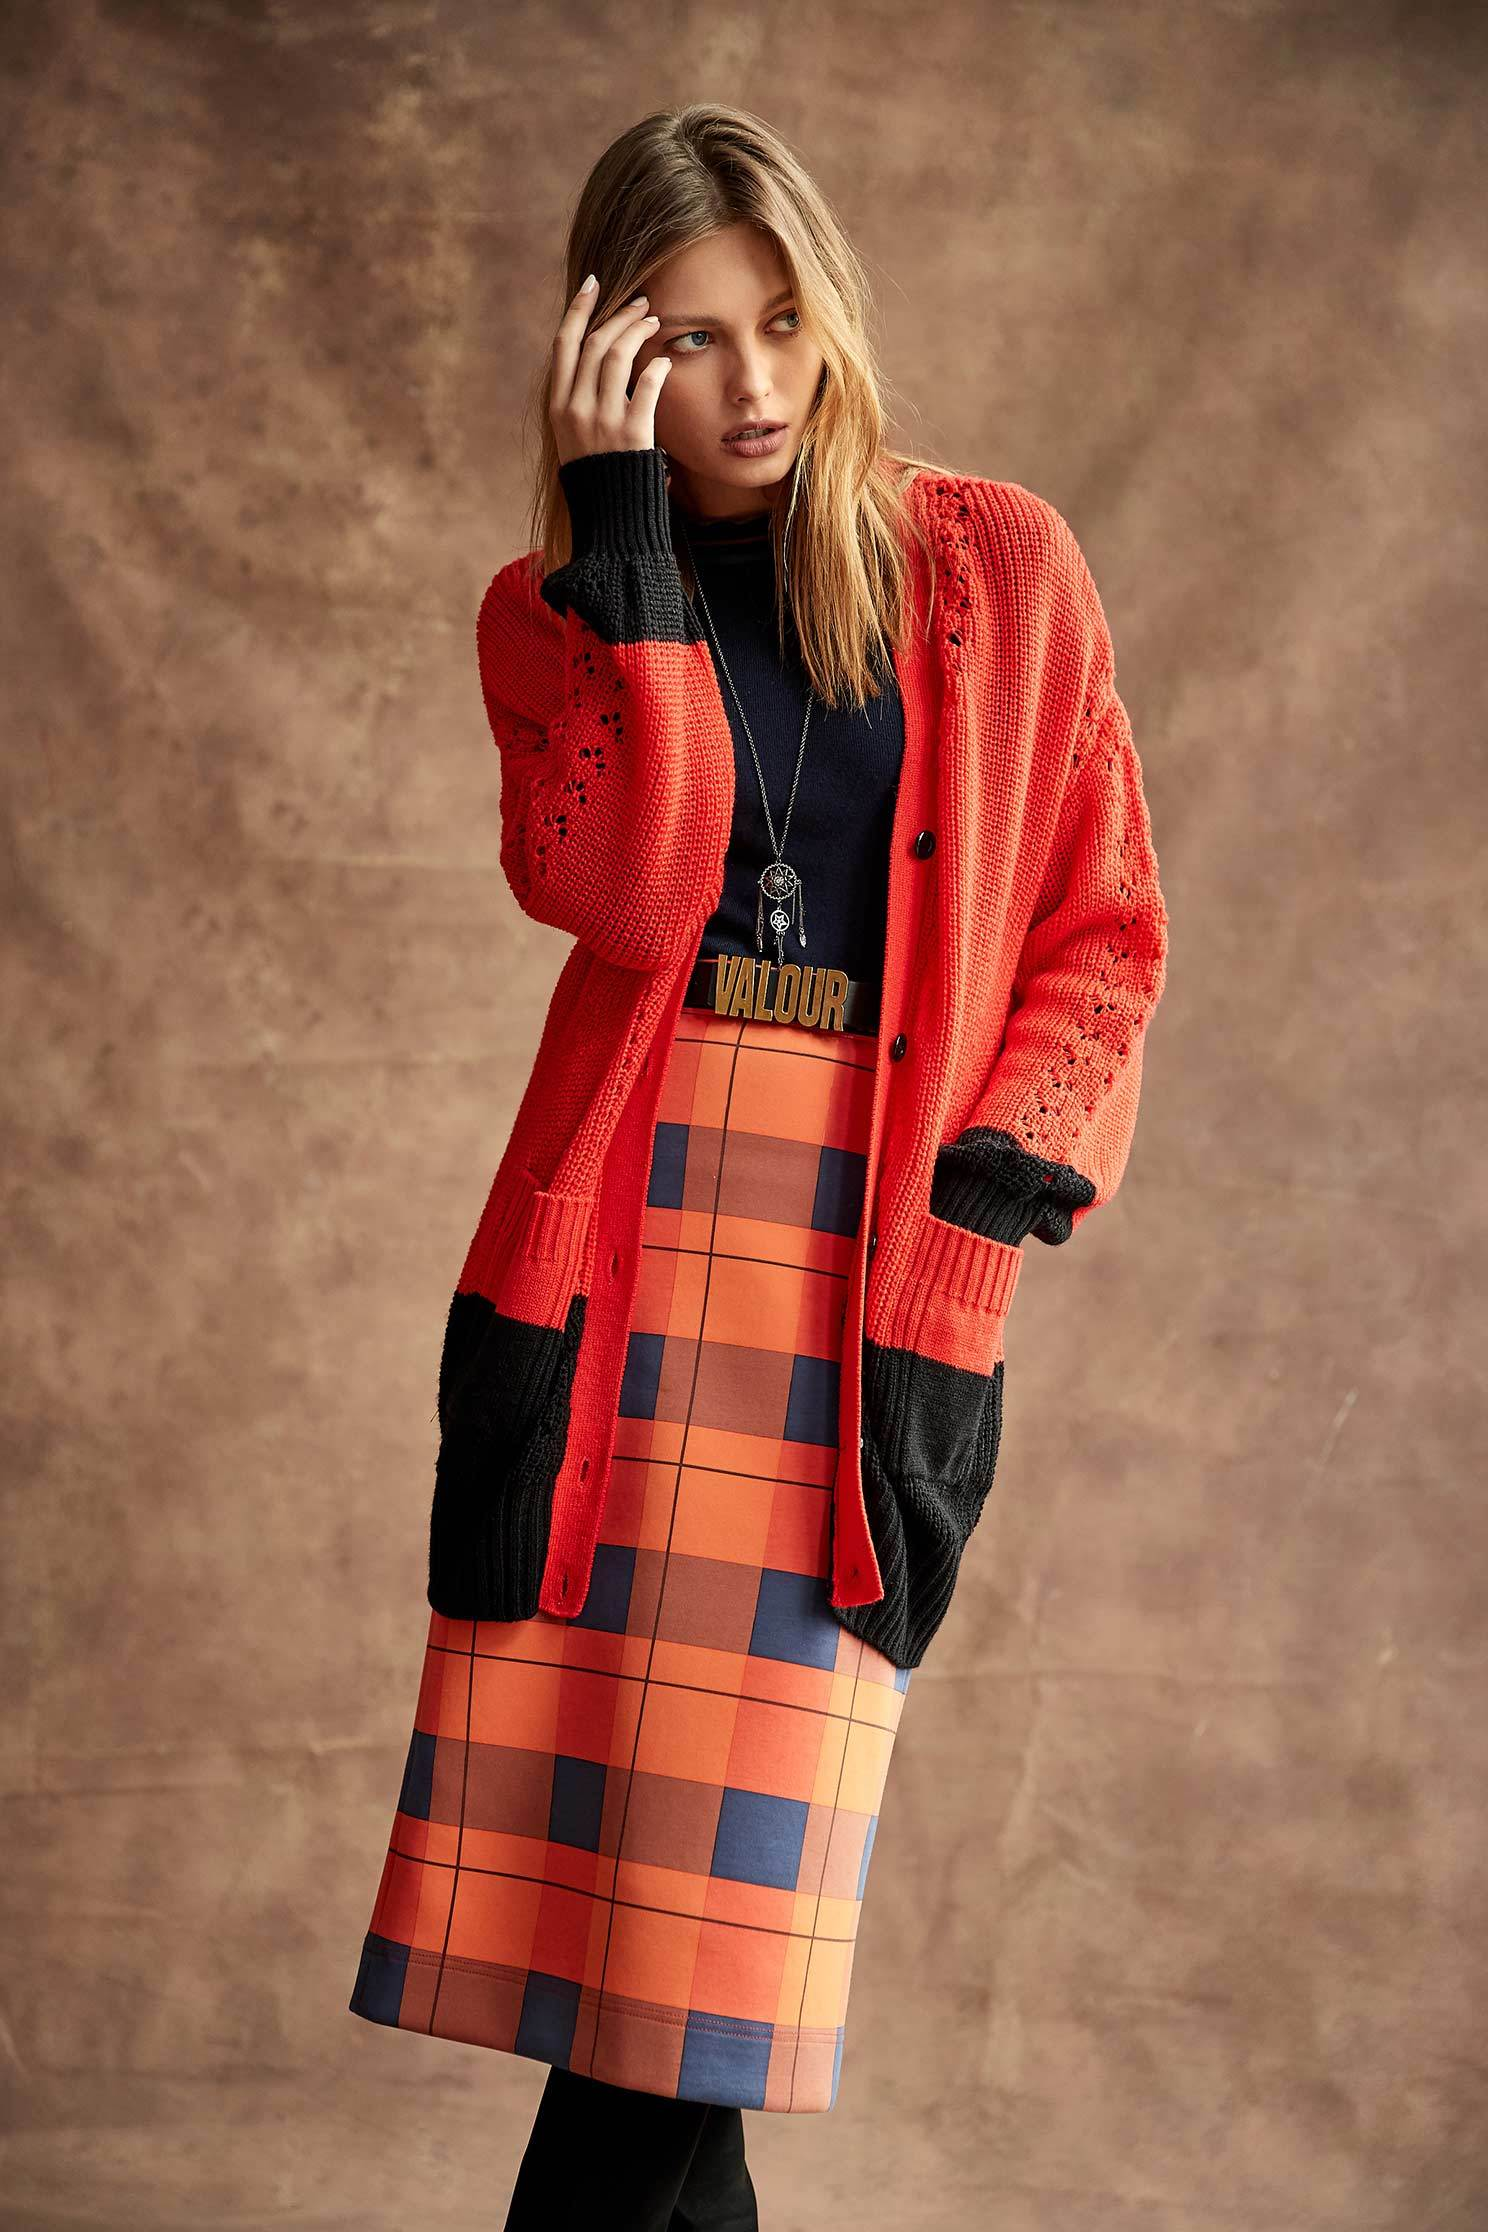 Color cardigan,coldforwinter,cardigan,knitting,knittedjacket,knittedtop,longcoat,longsleeveouterwear